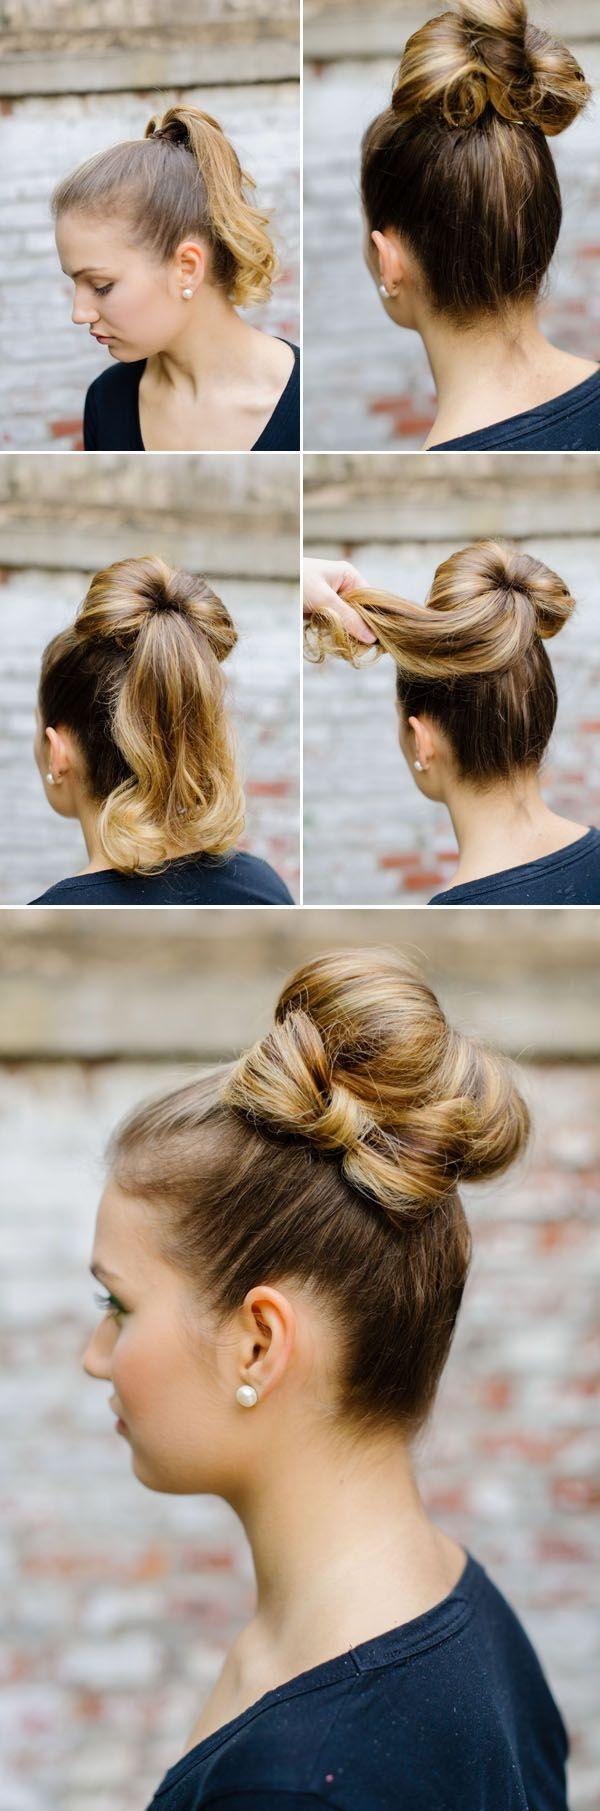 Easy Bun Hairstyles for Women (22)